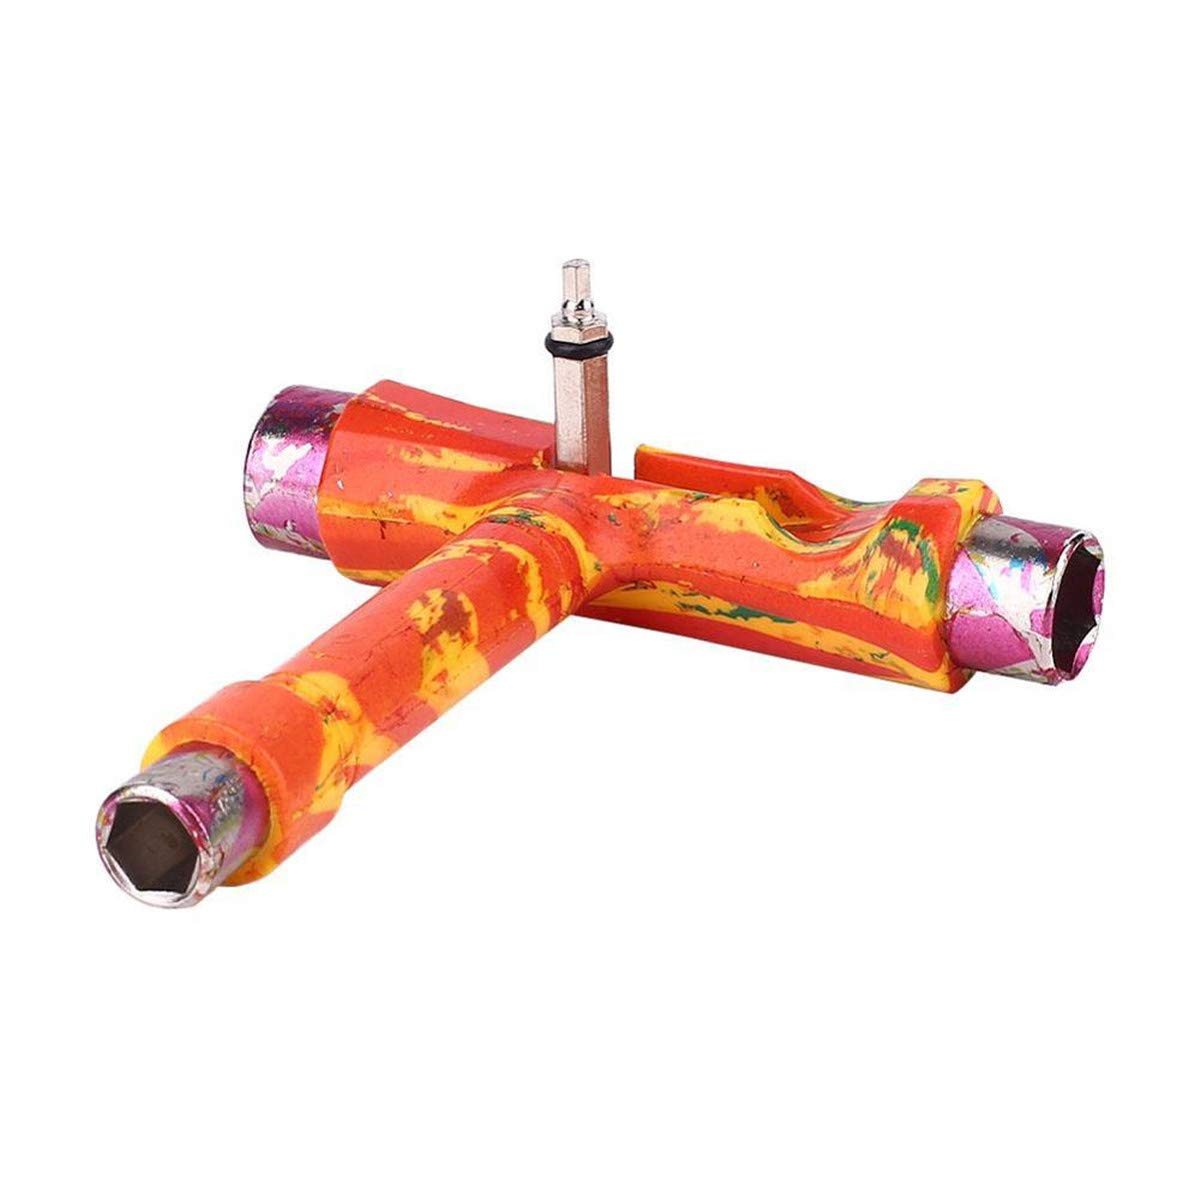 Cozylkx Multi-Function Skateboards T-Tool Kit Portable Skate Tool Accessory Allen and Philips Key, Yellow TM